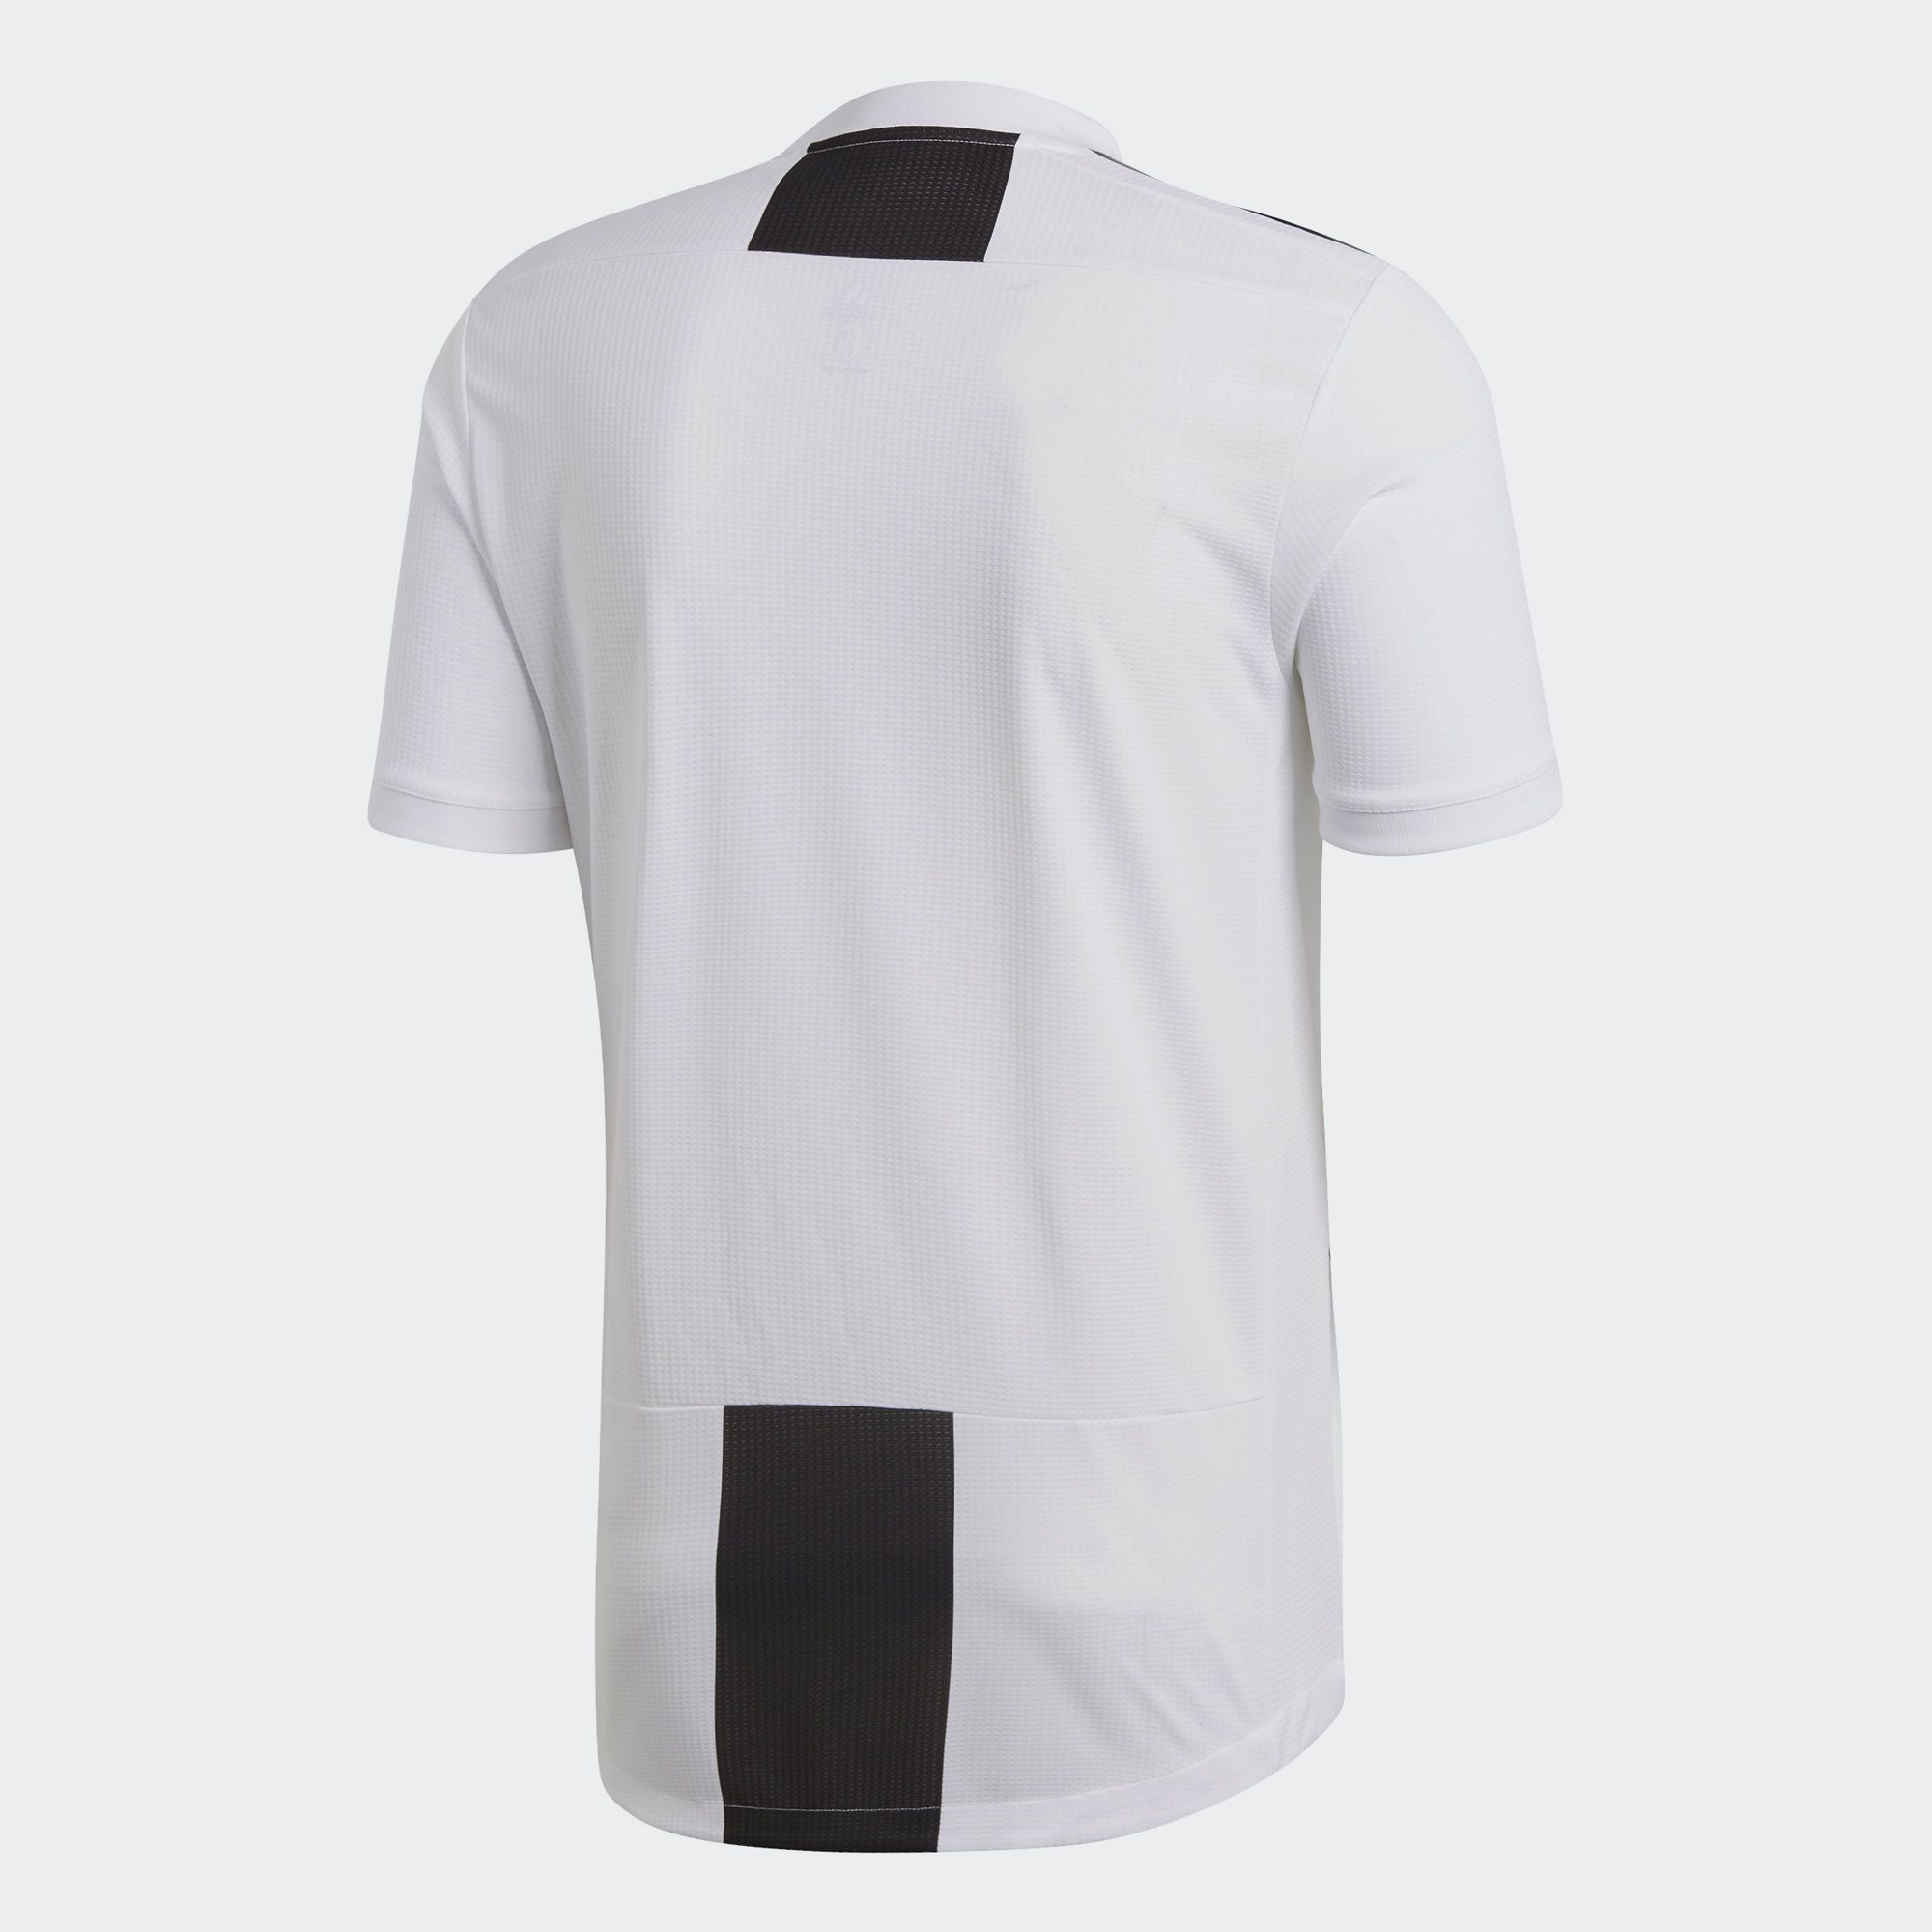 Juventus 2018-19 Adidas Home Kit  d06f62ec5e1f4